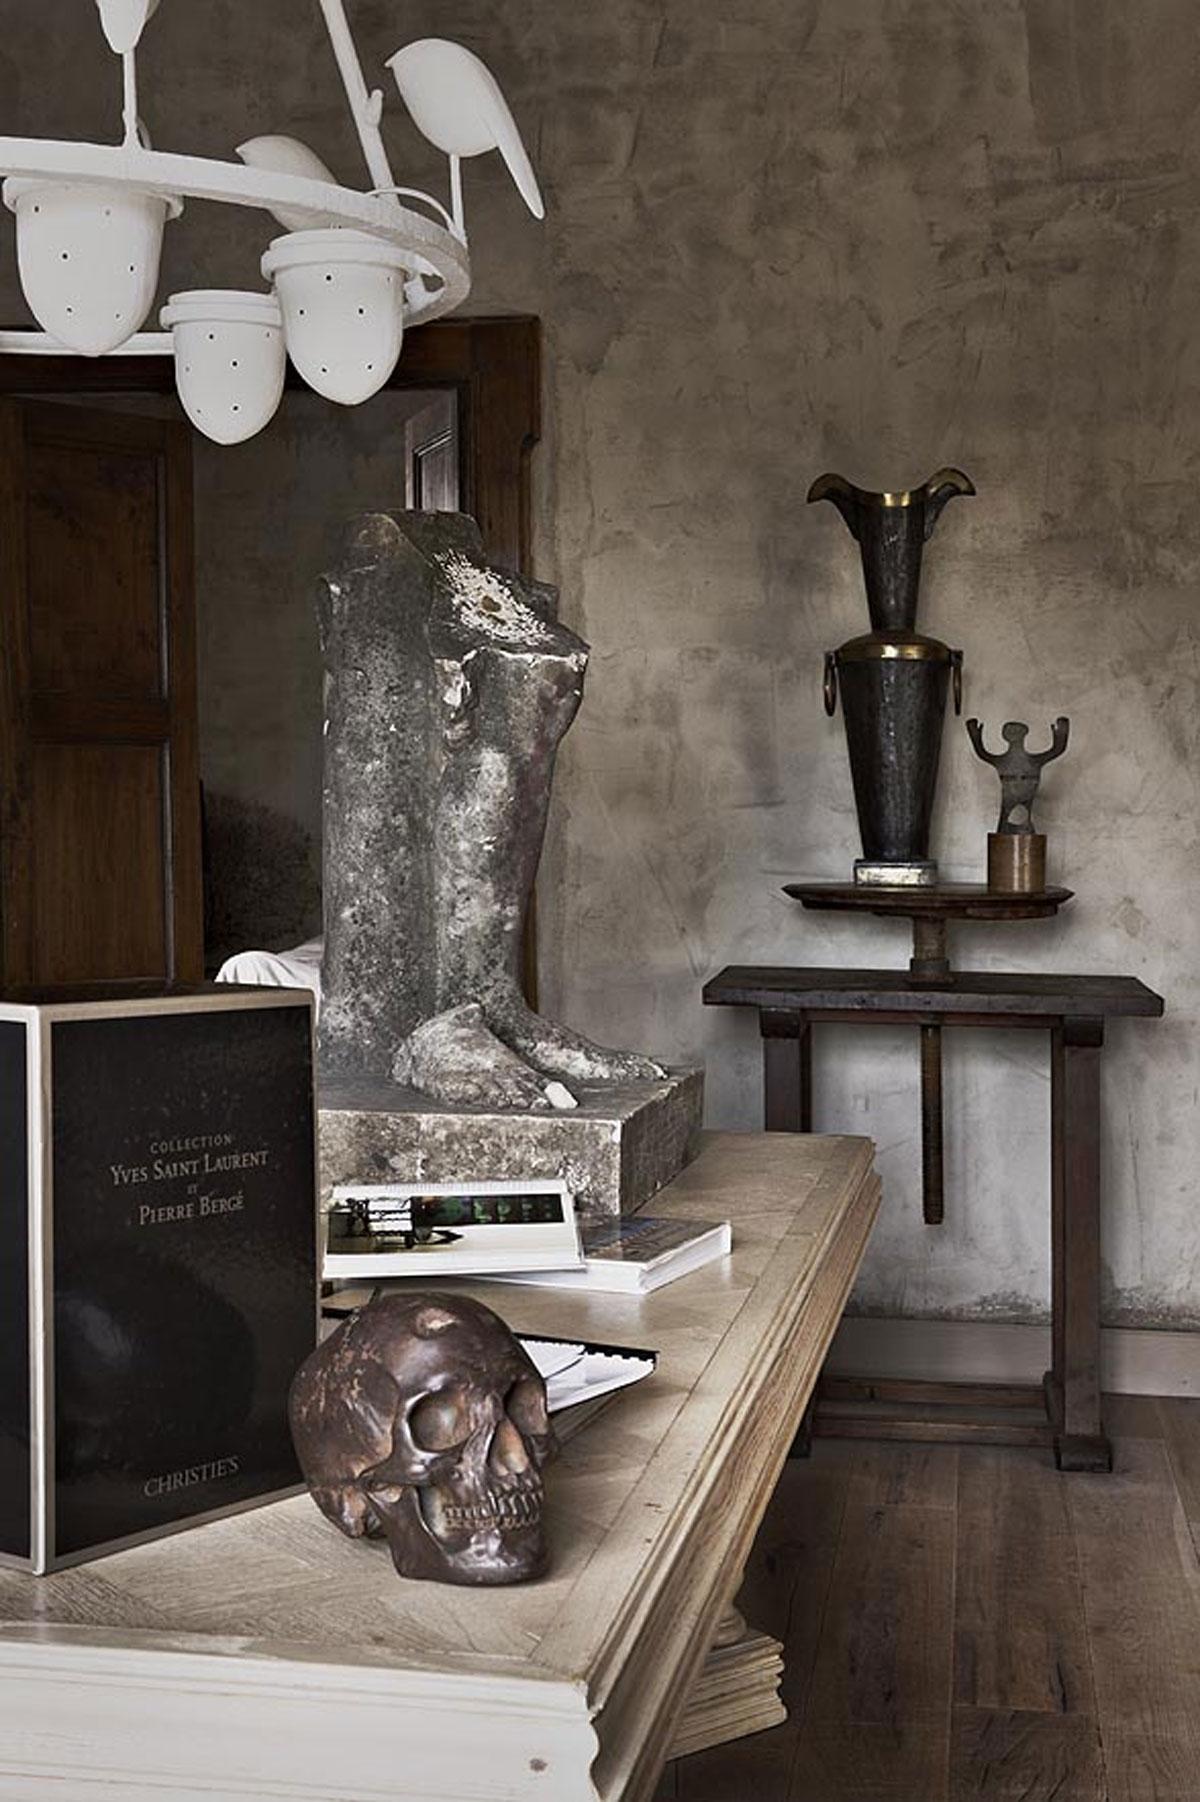 Serge-castella-interiors-Country-living-02